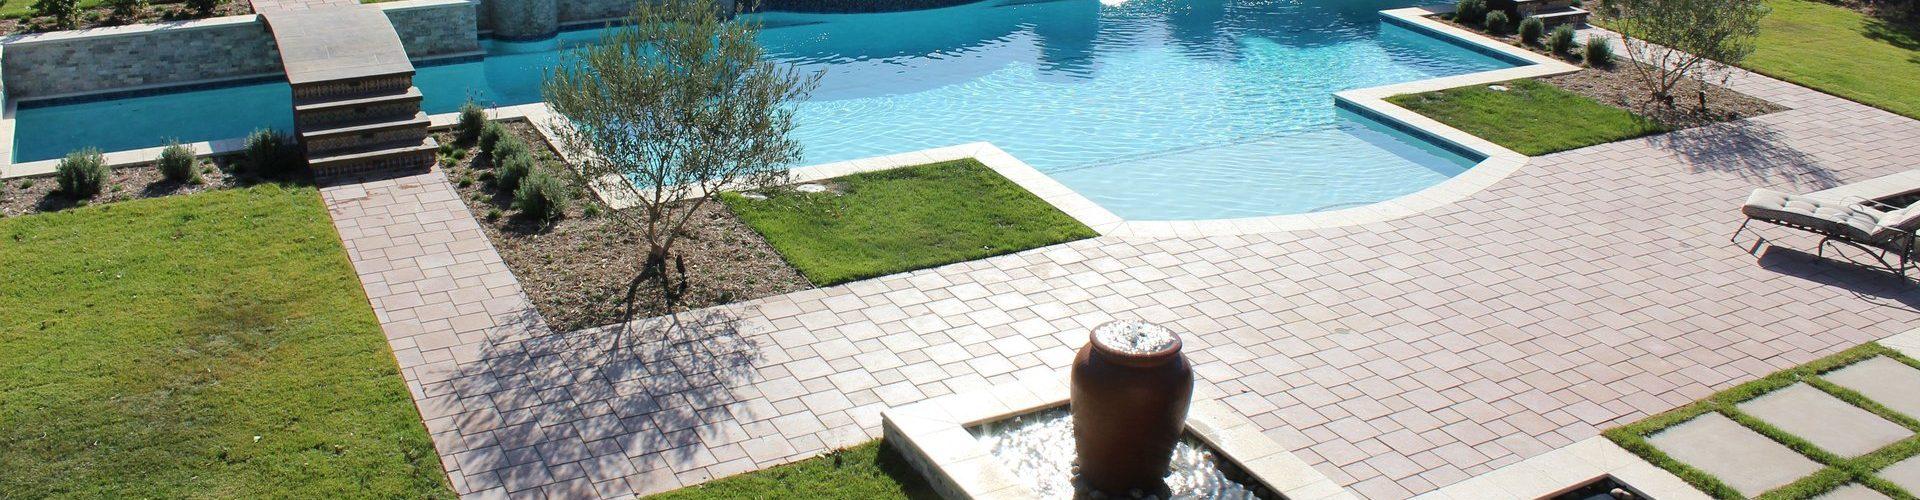 hardscape-scene-by-green-scene-landscape-and-swimming-pools-016